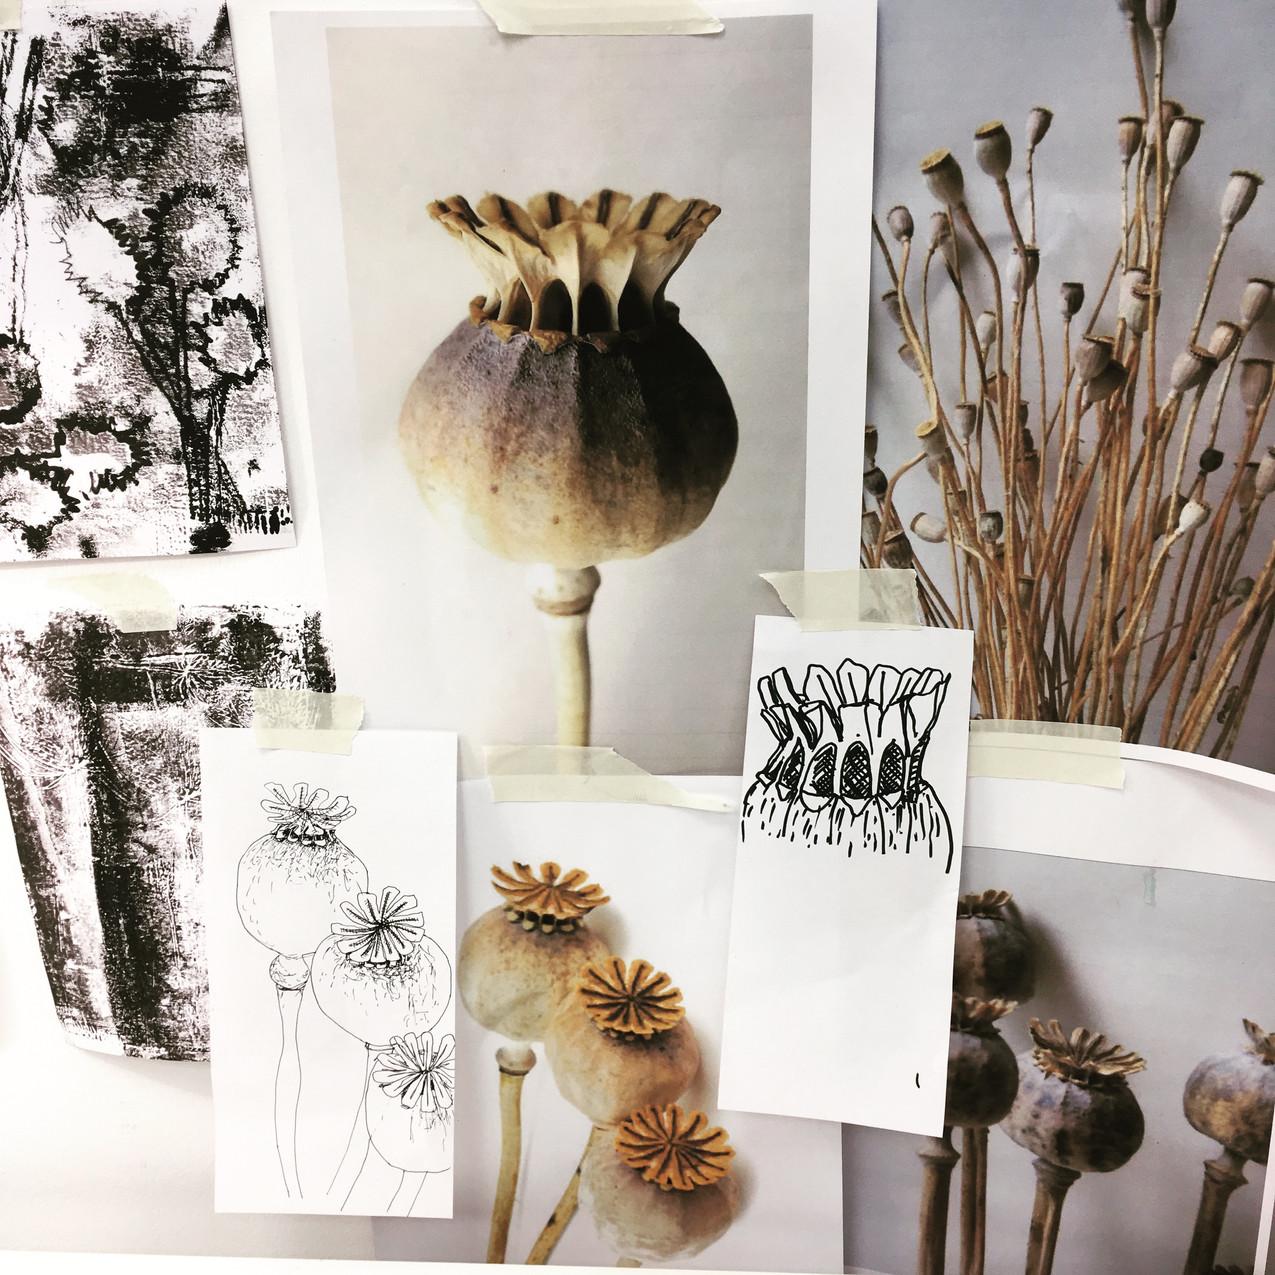 Poppy seed head studies